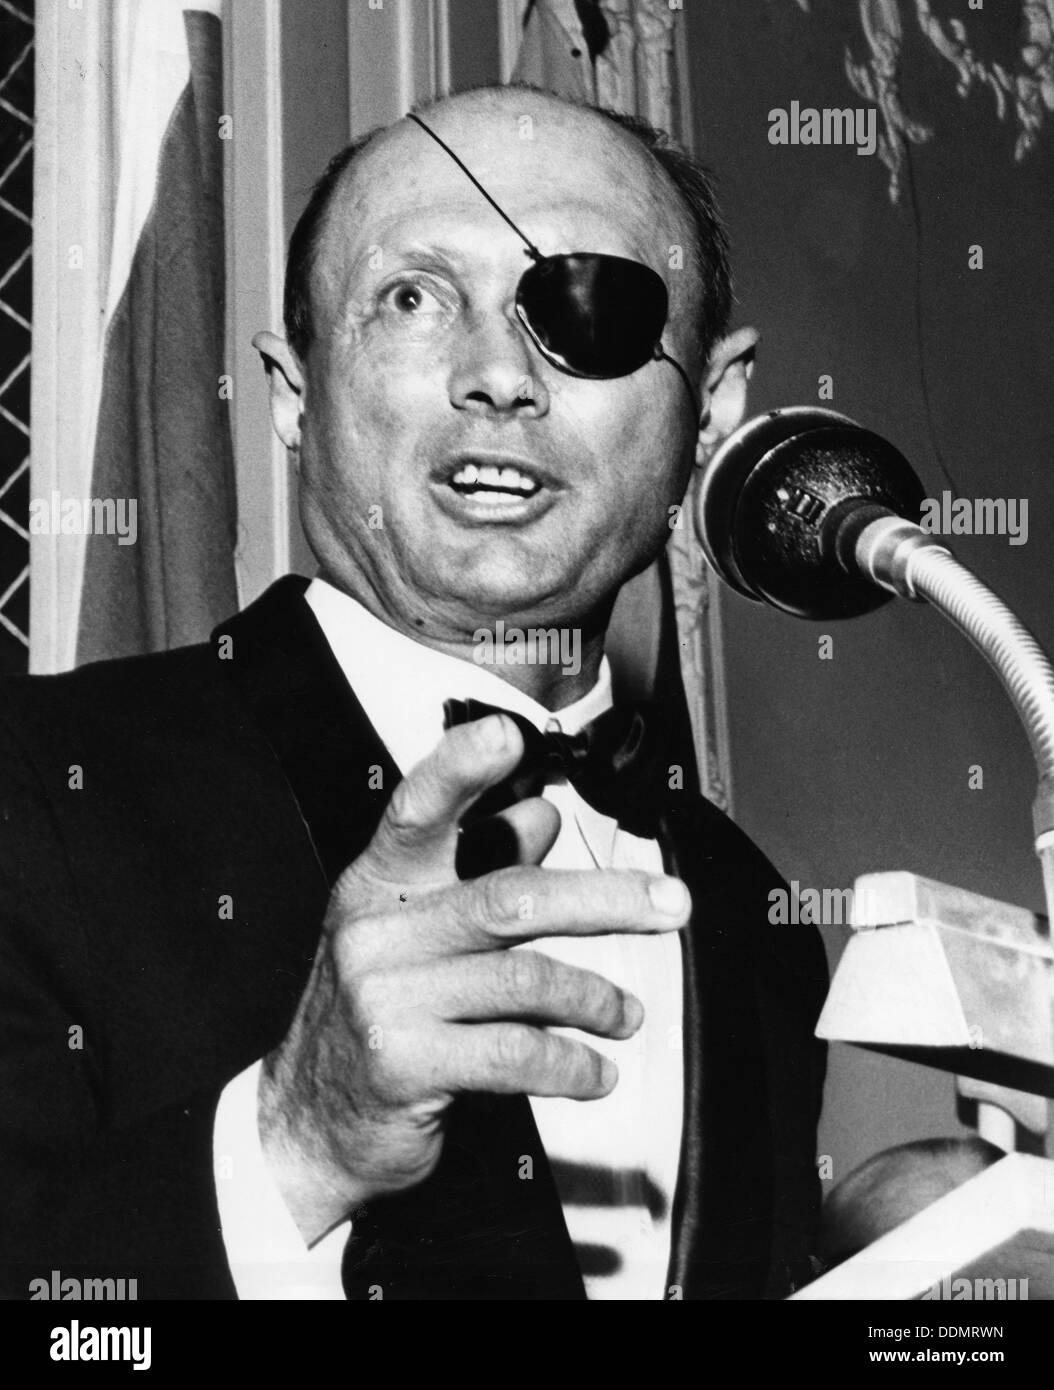 Moshe Dayan (1915-1981), Israeli General and politician, 1969. - Stock Image